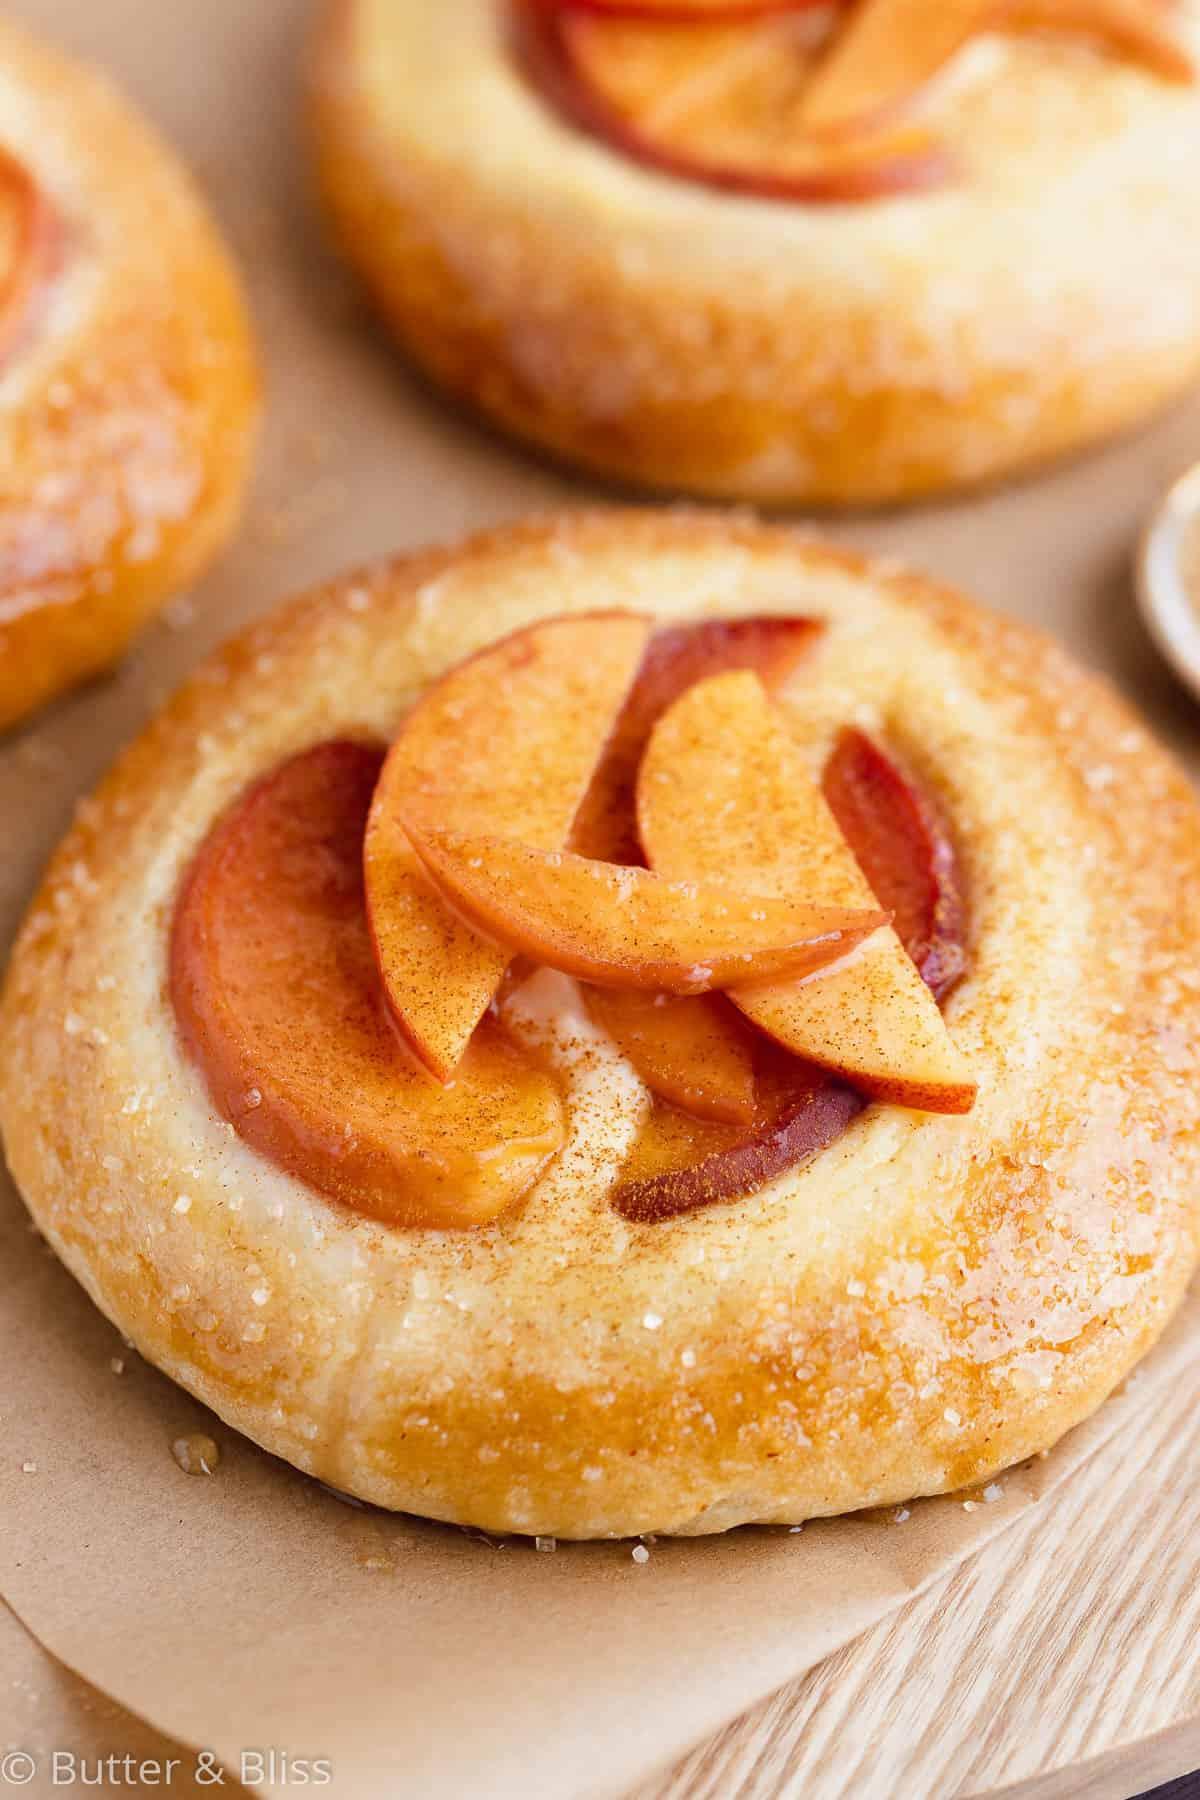 Close up of a peach and vanilla custard mini kuchen pie